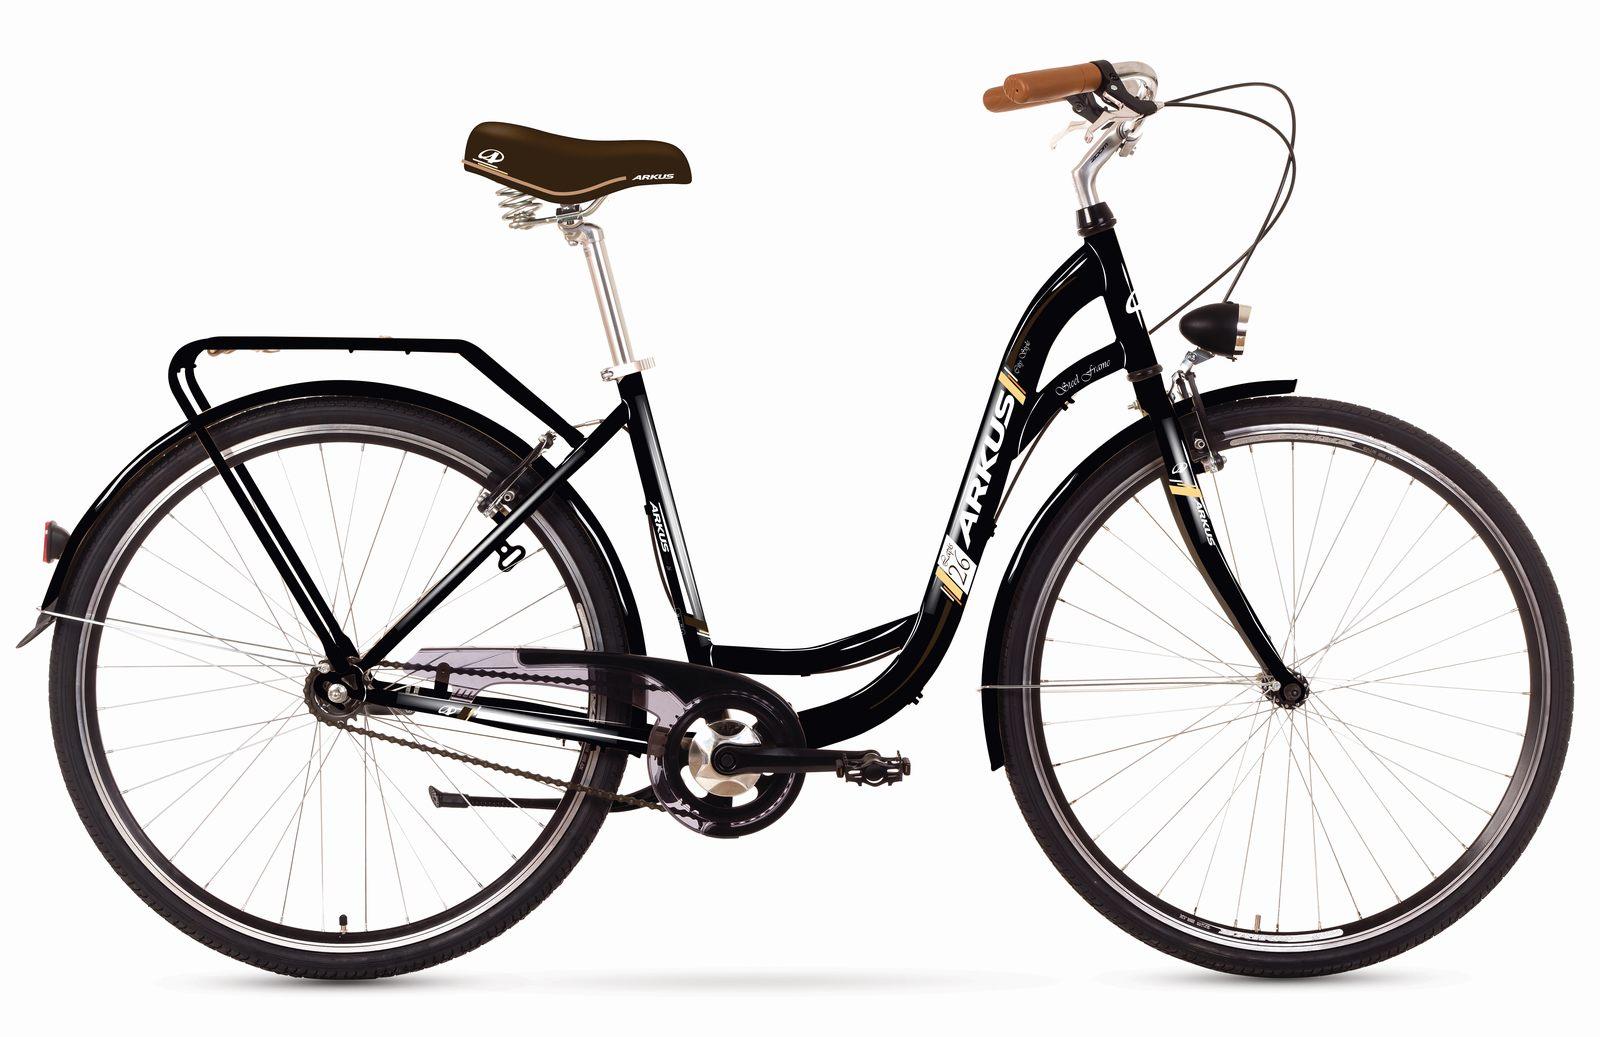 ARKUS ANGEL 28 - 3 CITY 17-M R28 MELNS Pilsētas velosipēds